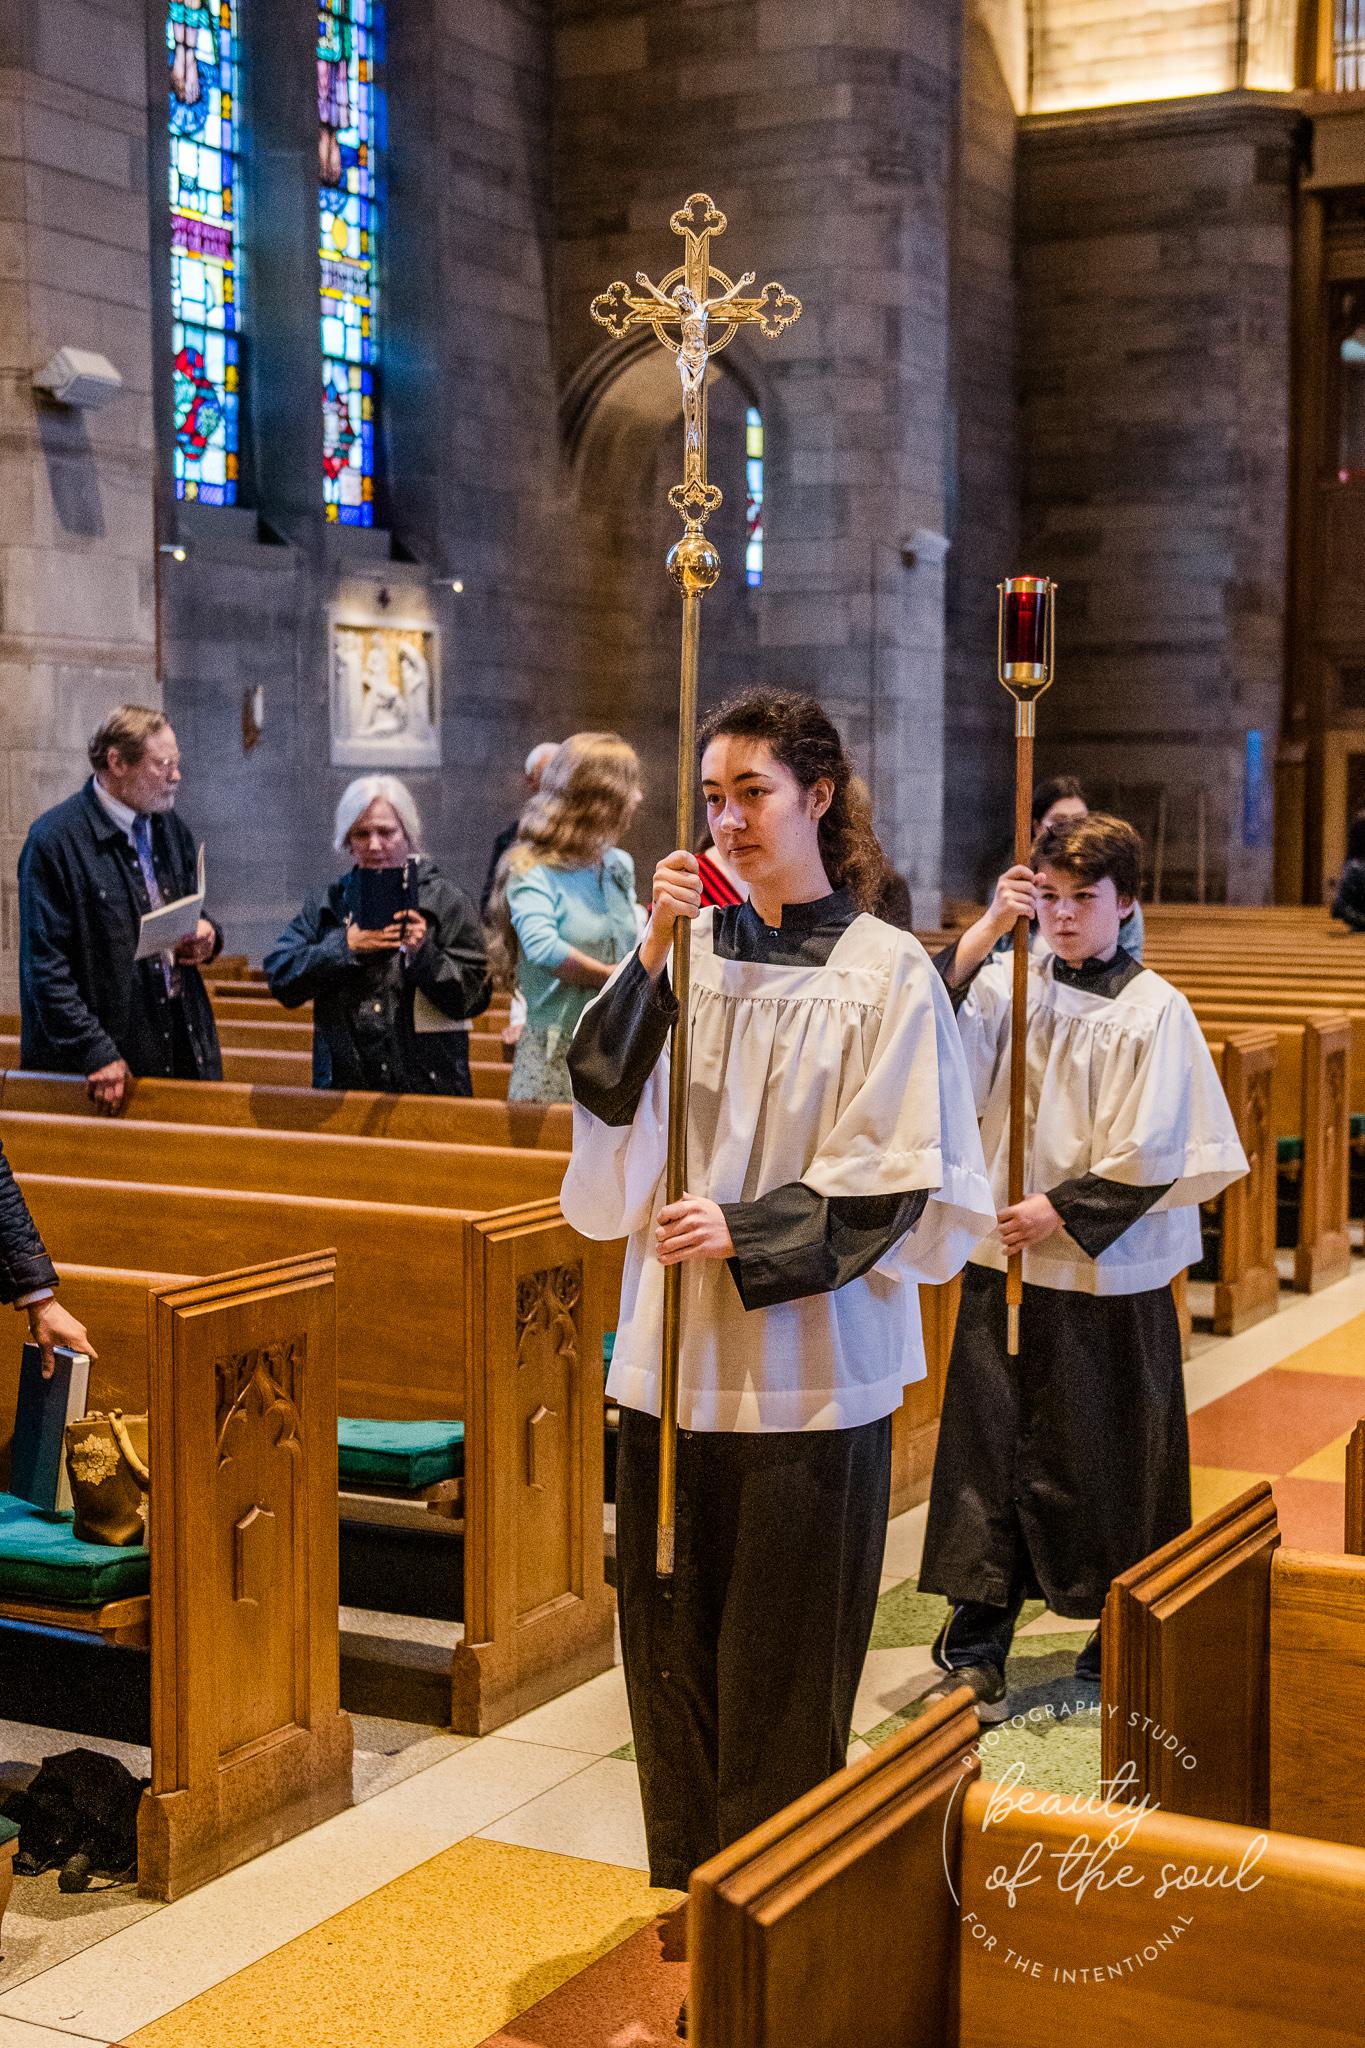 washington-dc-st-ann-catholic-church-first-holy-communion-beauty-of-the-soul-studio-may-2019-02.jpg